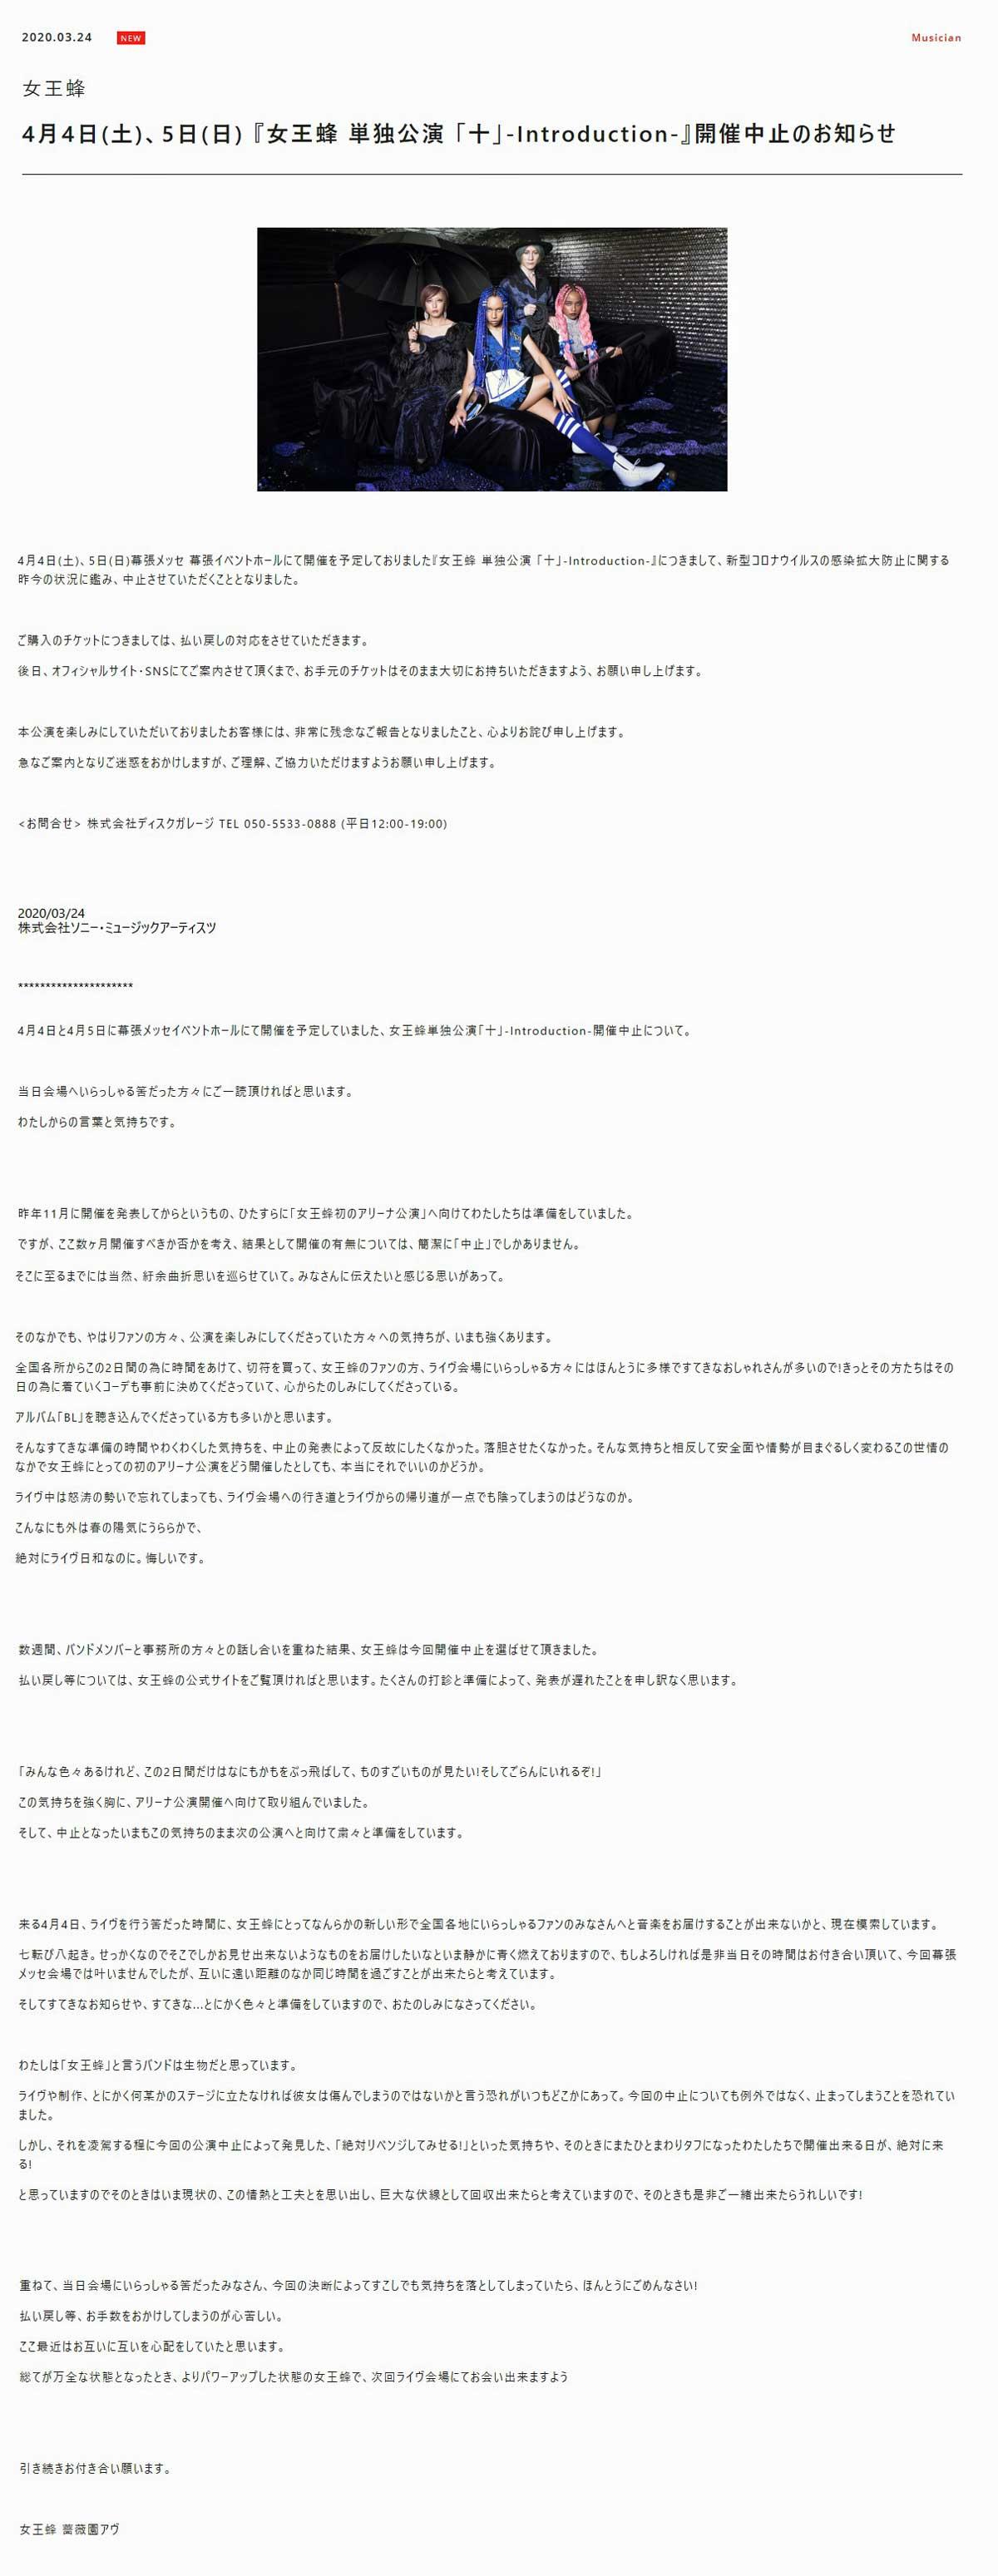 女王蜂単独公演「十」-Introduction-の公演中止